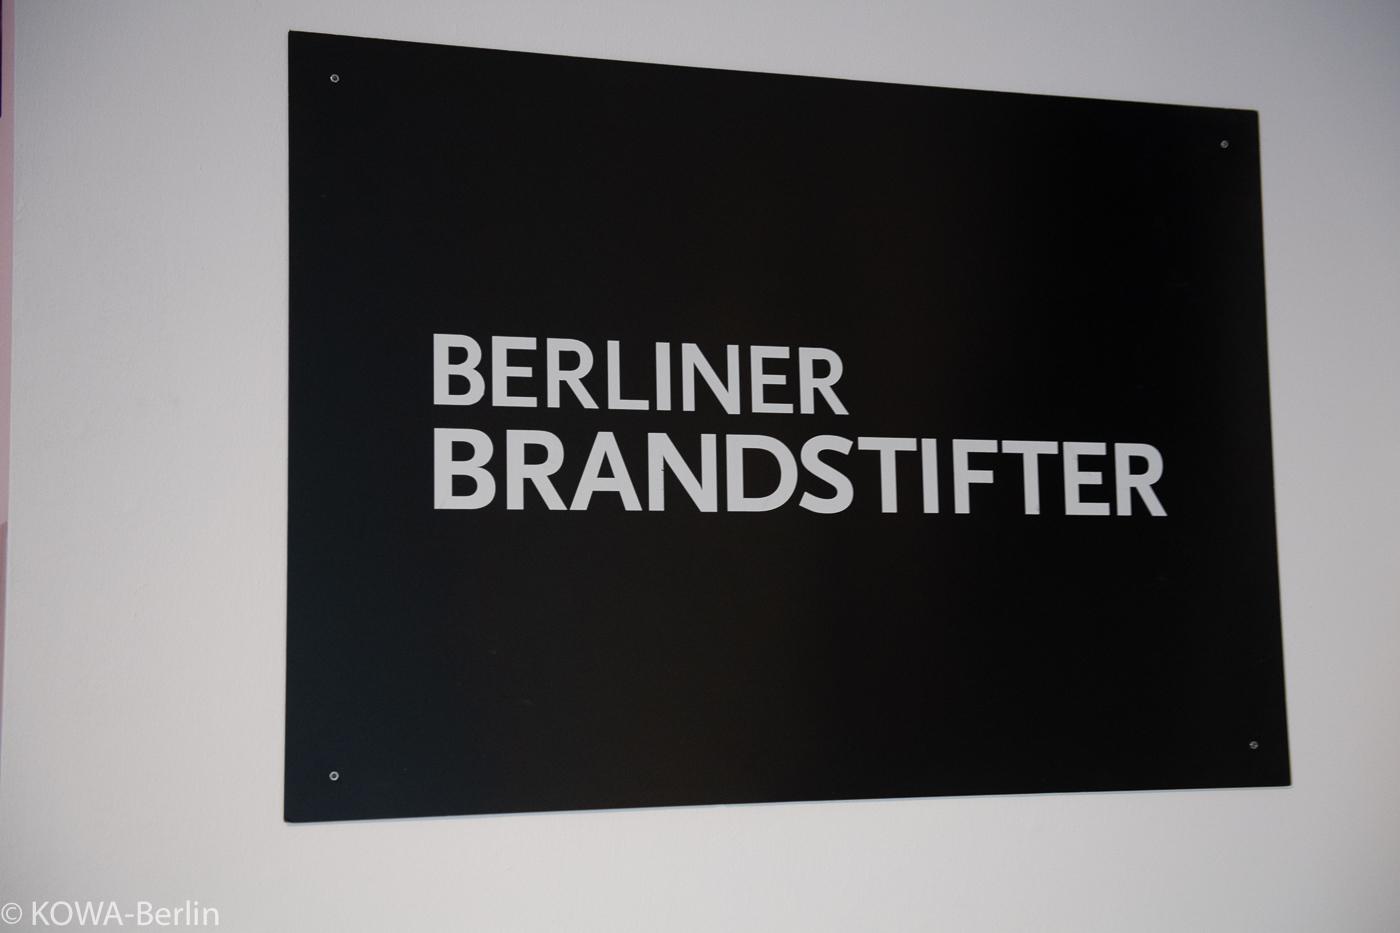 Berliner Brandstifter X Sven Marquardt - Kunstedition